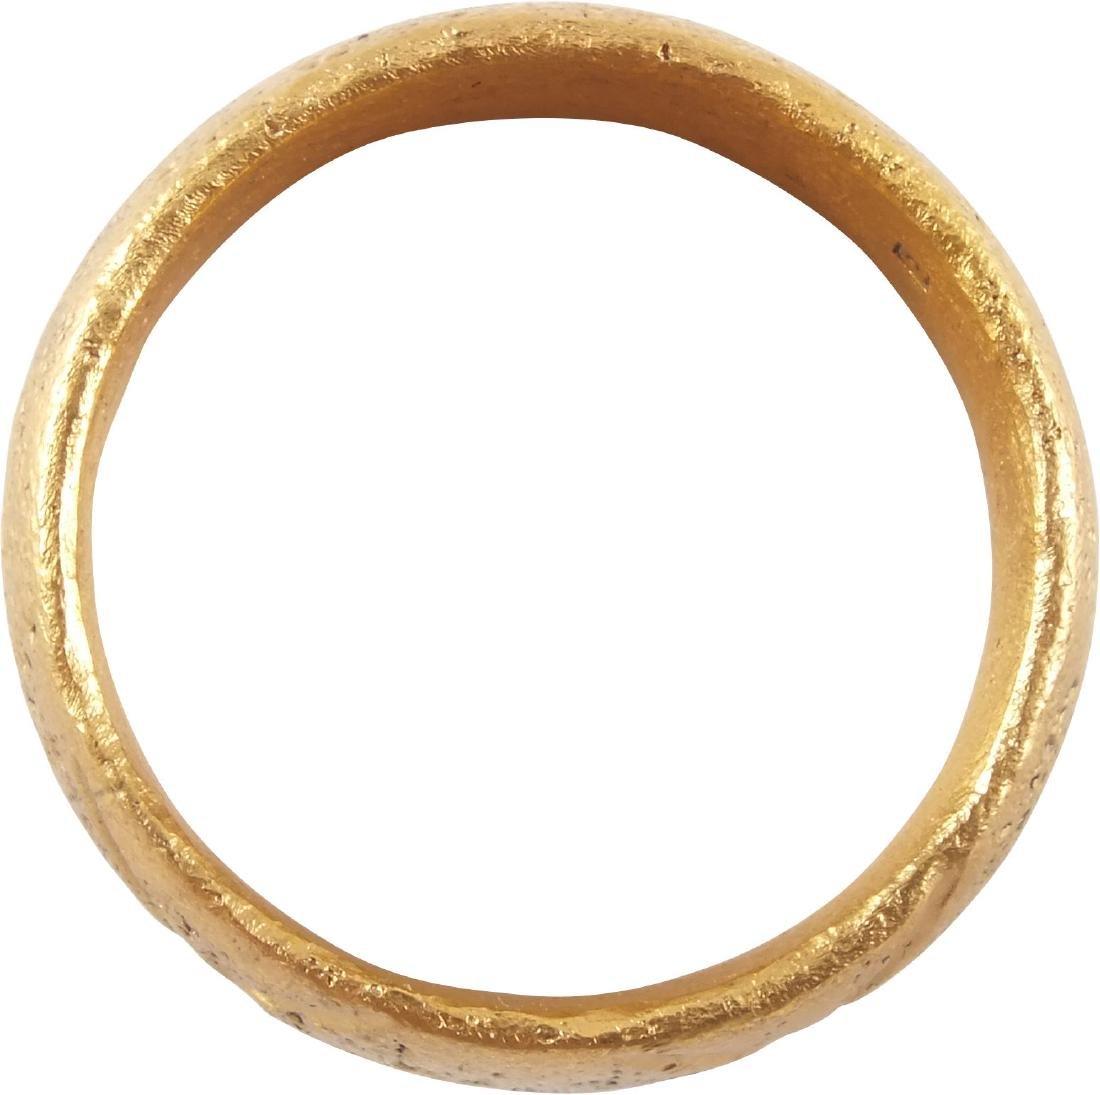 VIKING MAN'S RING 9th-10th CENTURY AD - 2